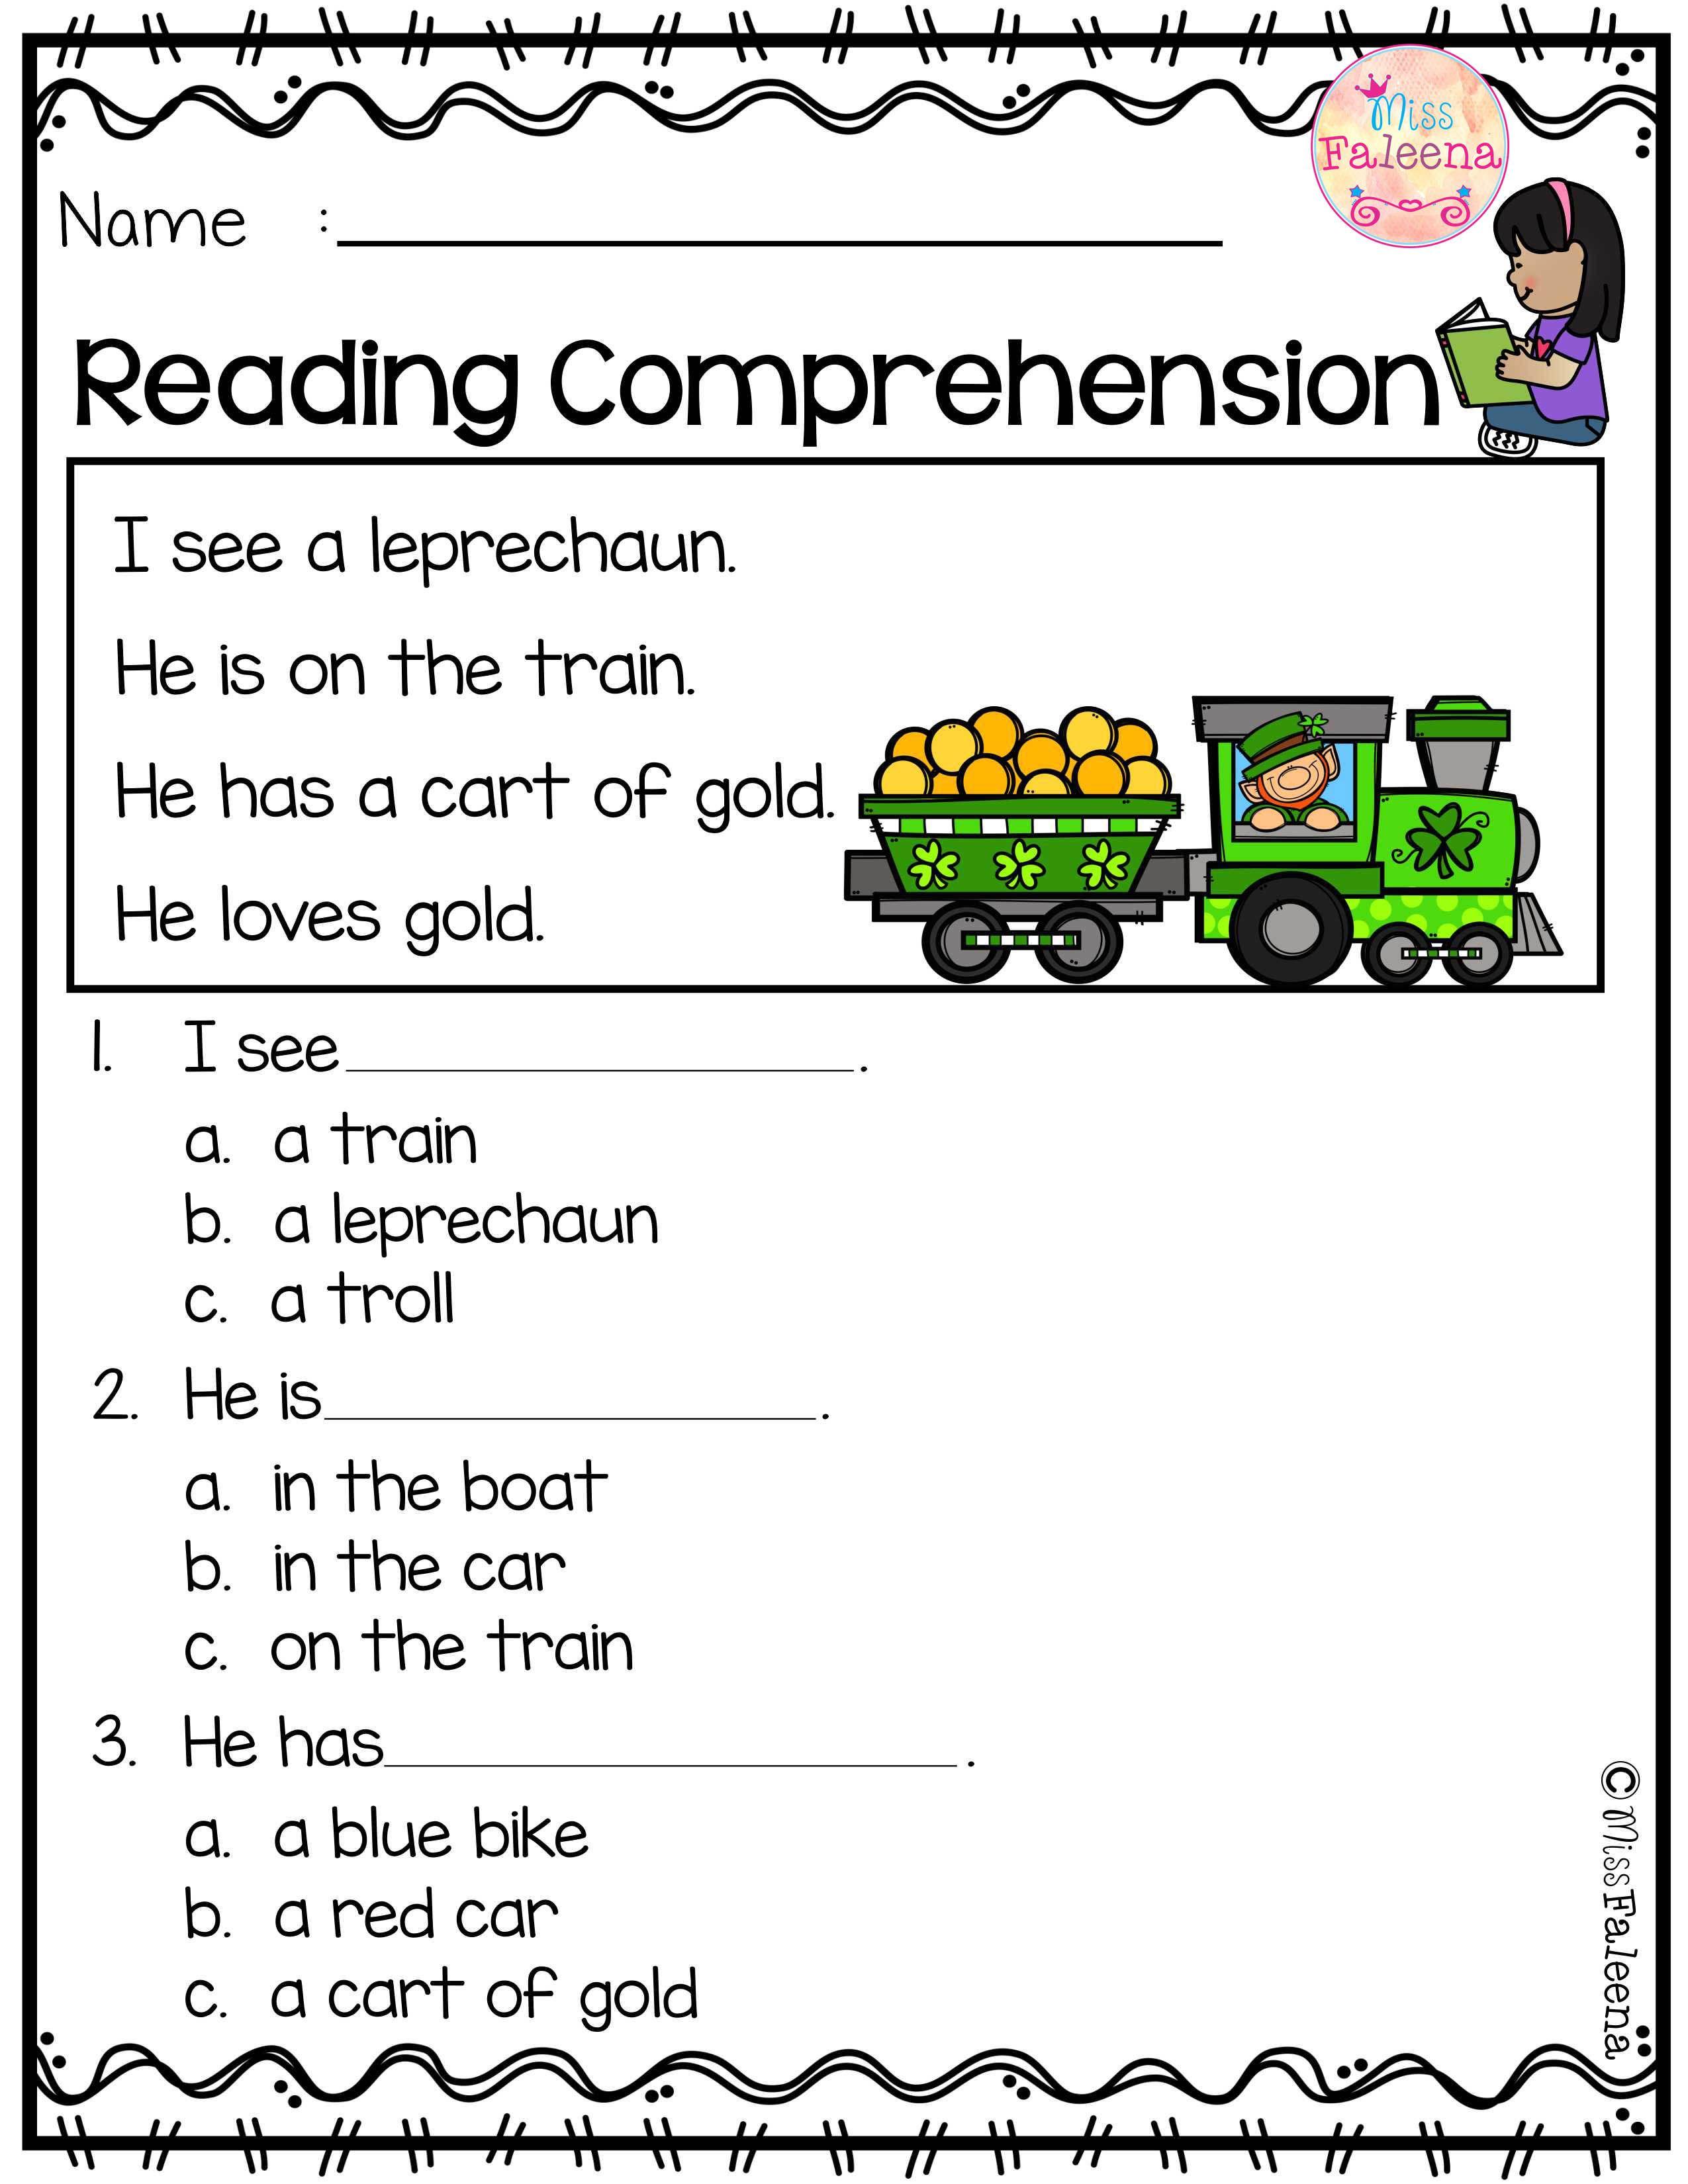 March Reading Comprehension | lesson plans | Pinterest